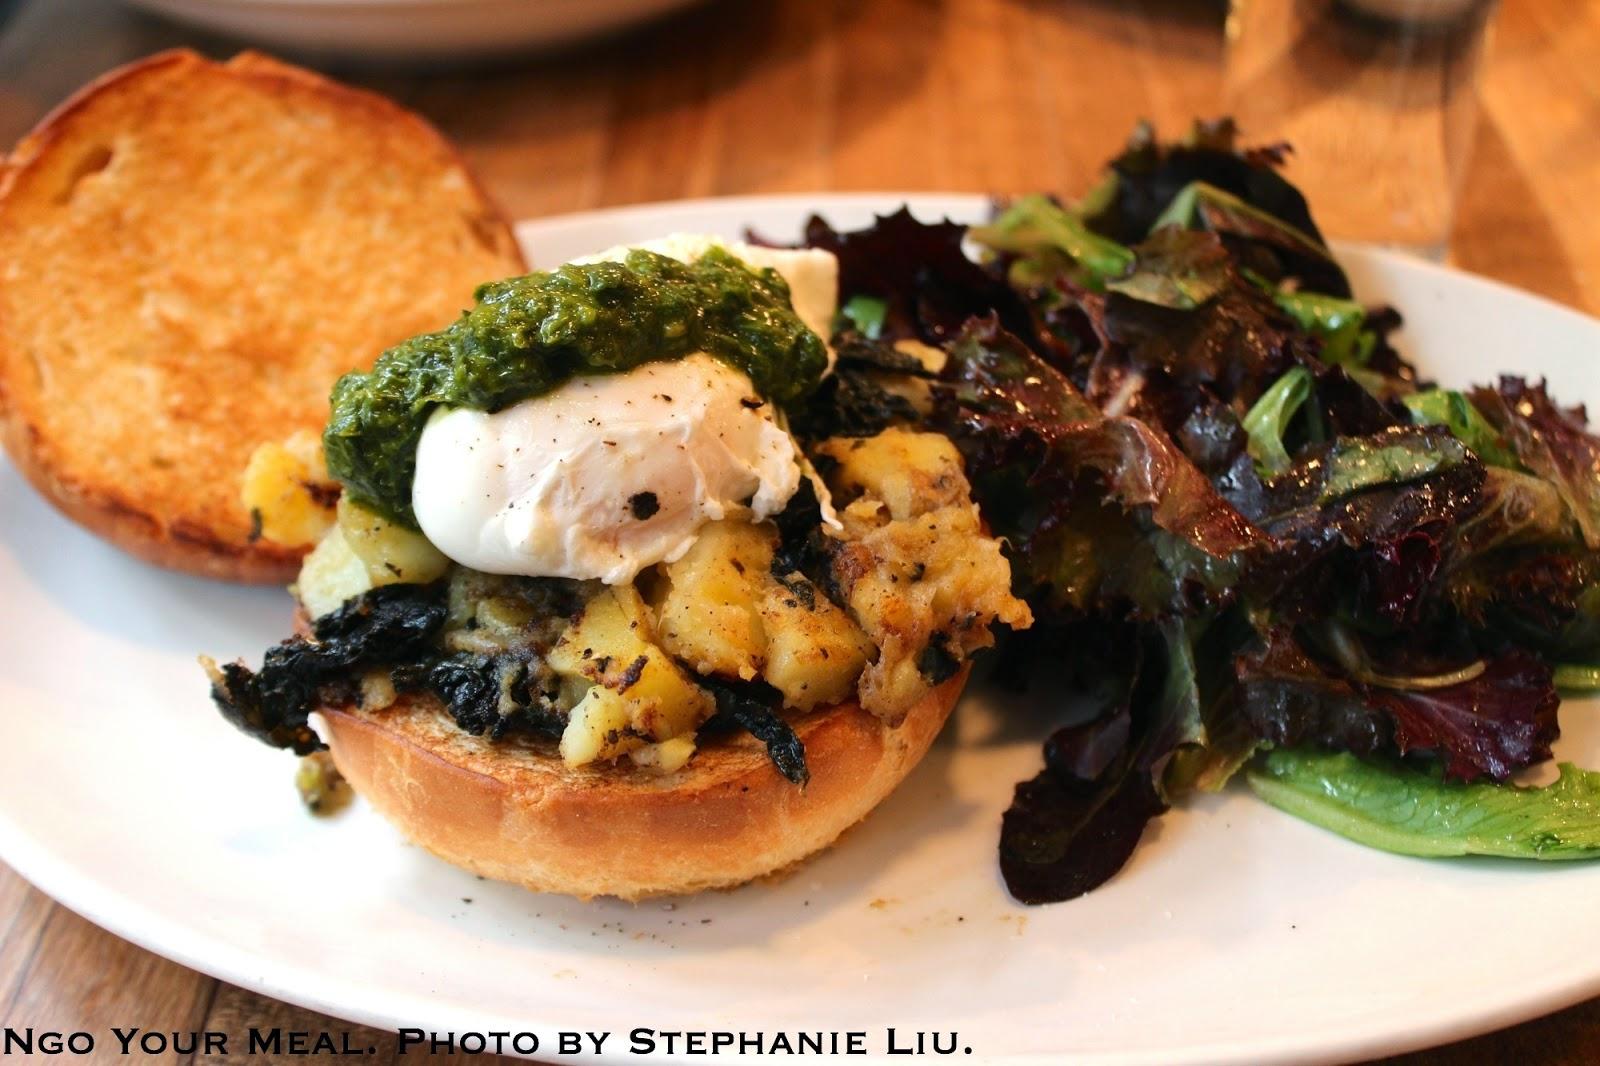 Egg Begley Jr. with Kale, Potato Hash, Poached Egg, Chimichurri